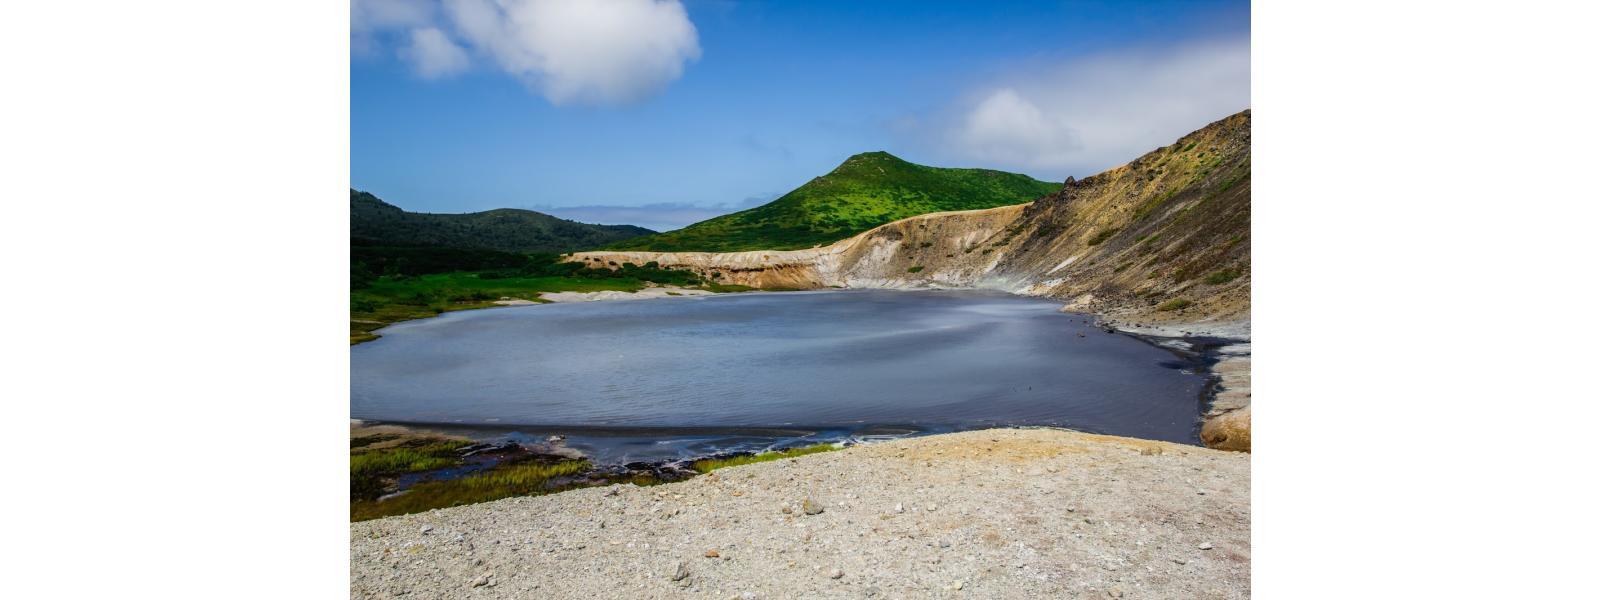 Озеро серебряное остров кунашир фото